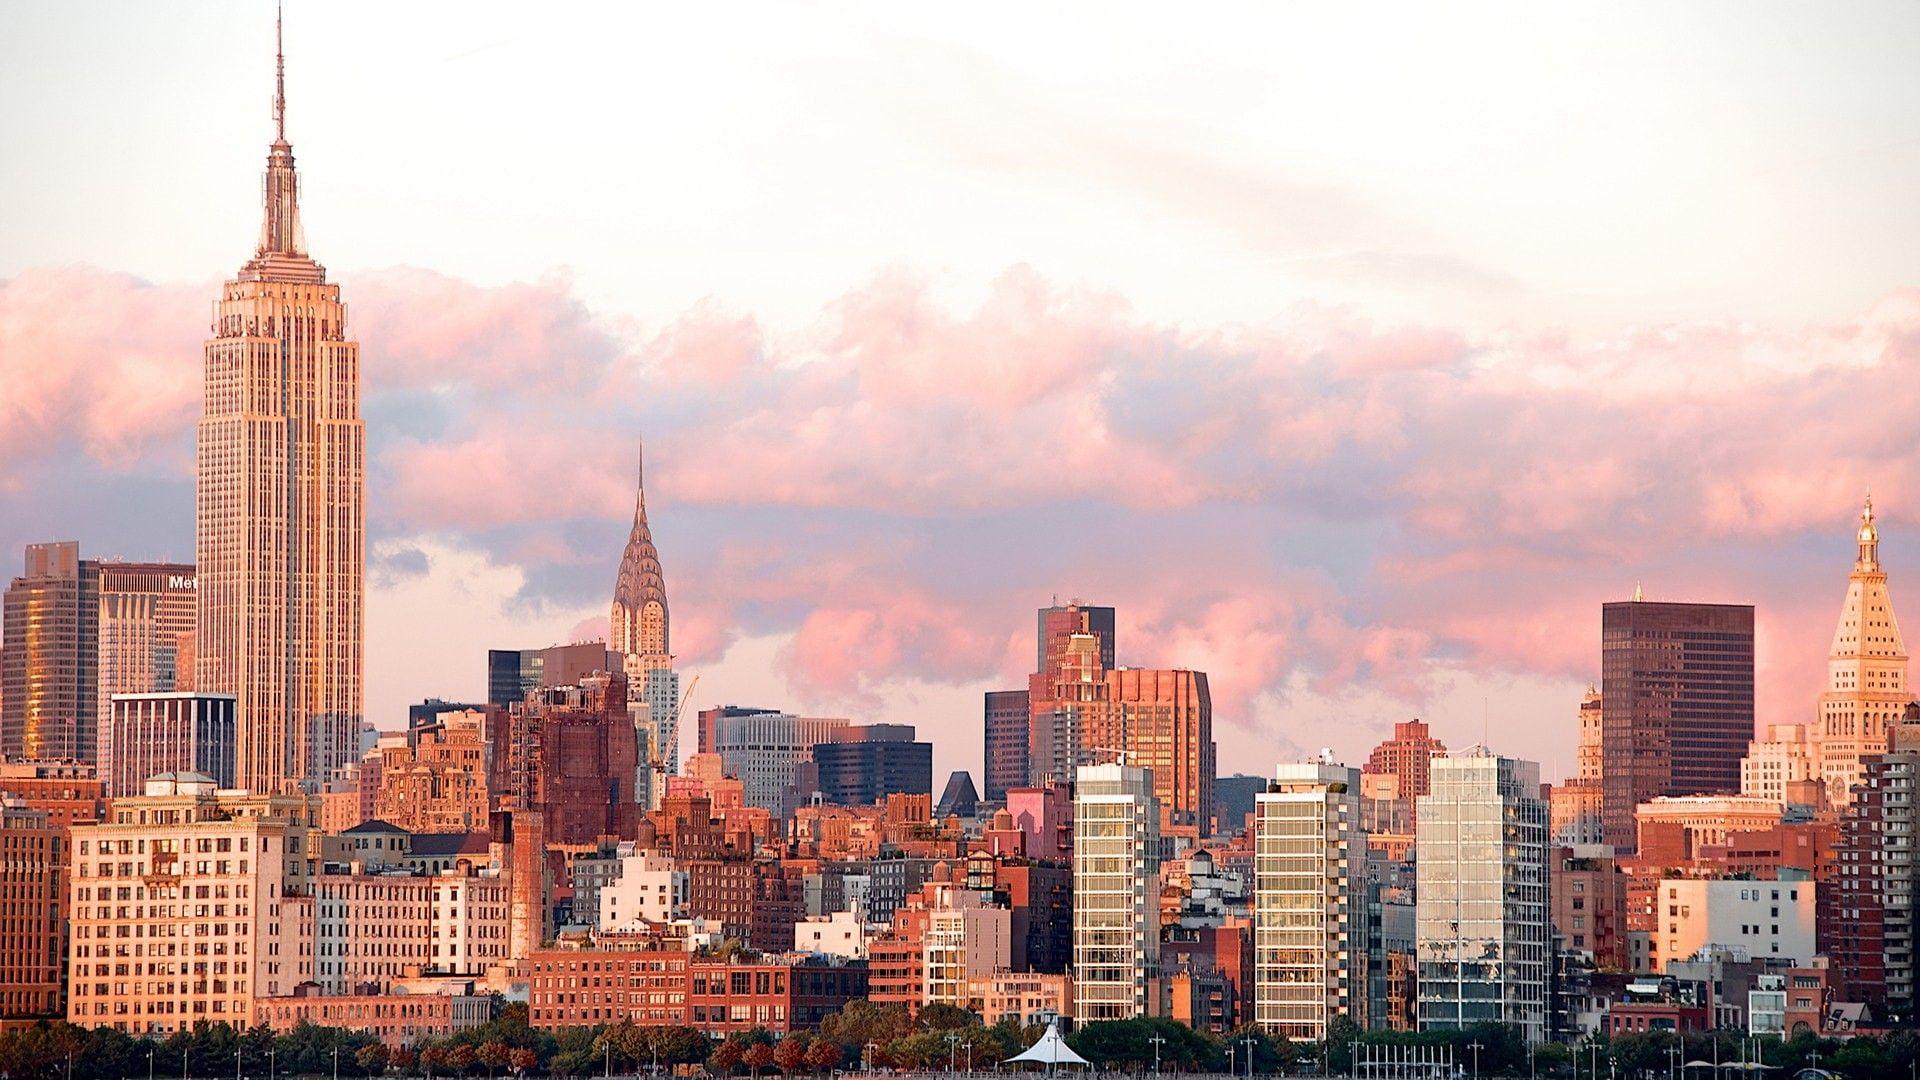 1920x1080 New York Backgrounds New York Wallpaper